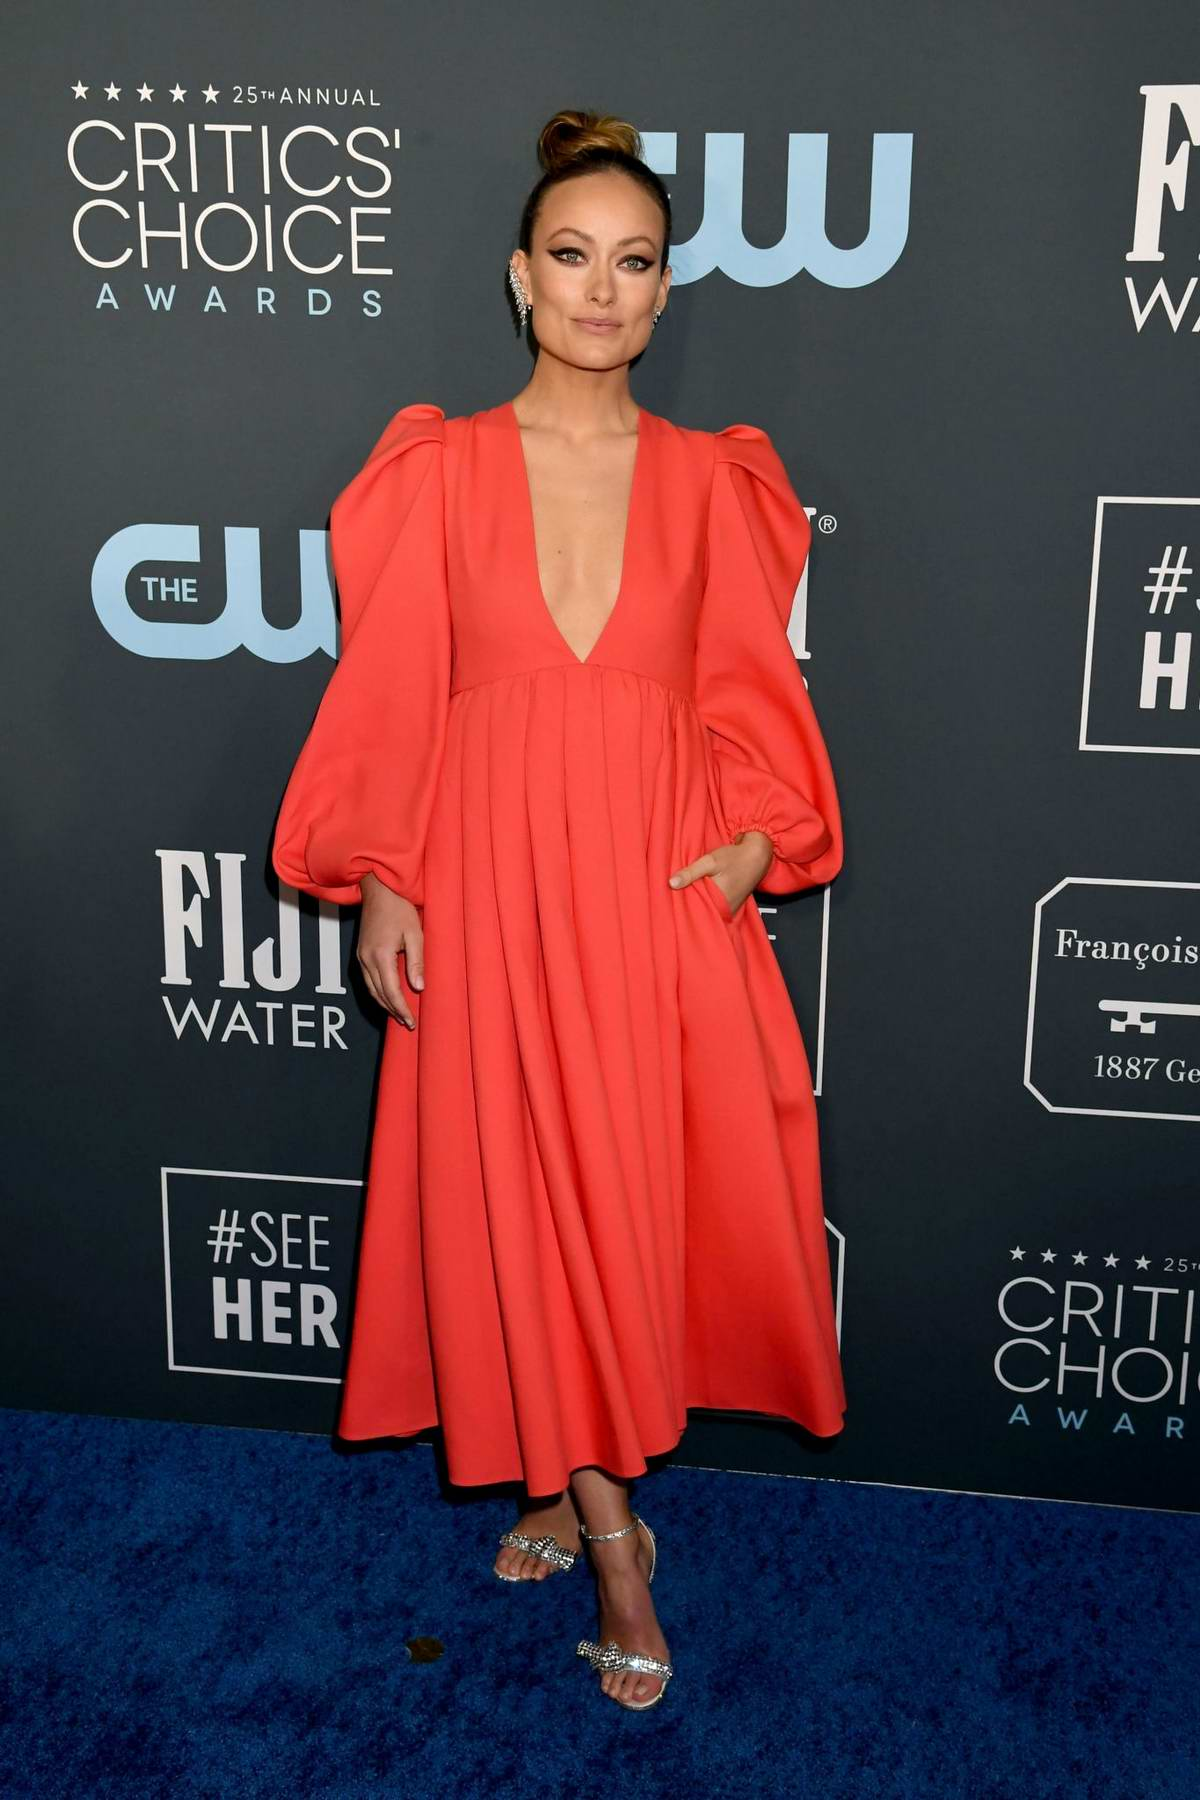 Olivia Wilde attends the 25th Annual Critics' Choice Awards at Barker Hangar in Santa Monica, California